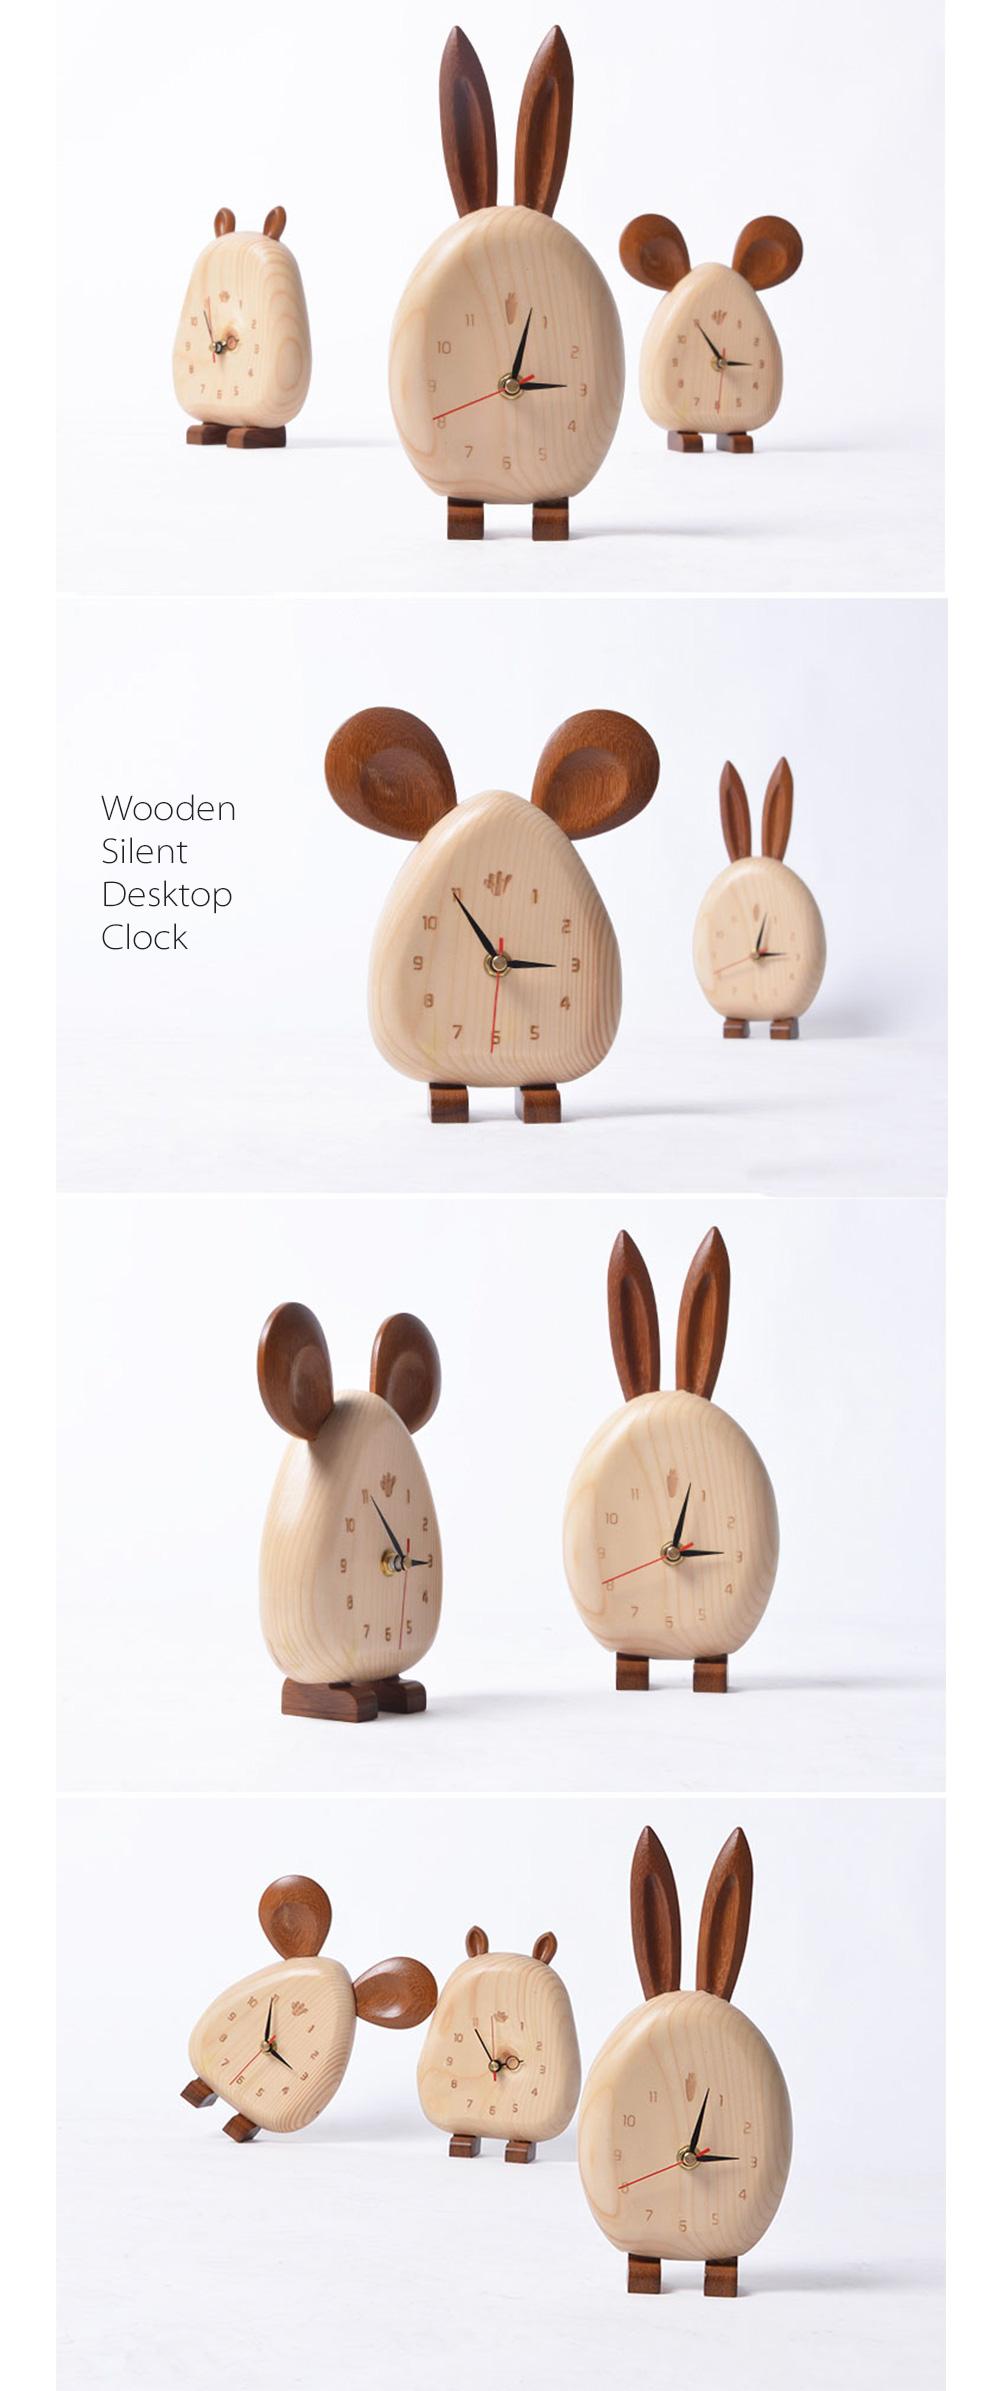 Wooden Silent Desktop Clock Wooden Silent Desktop Clock